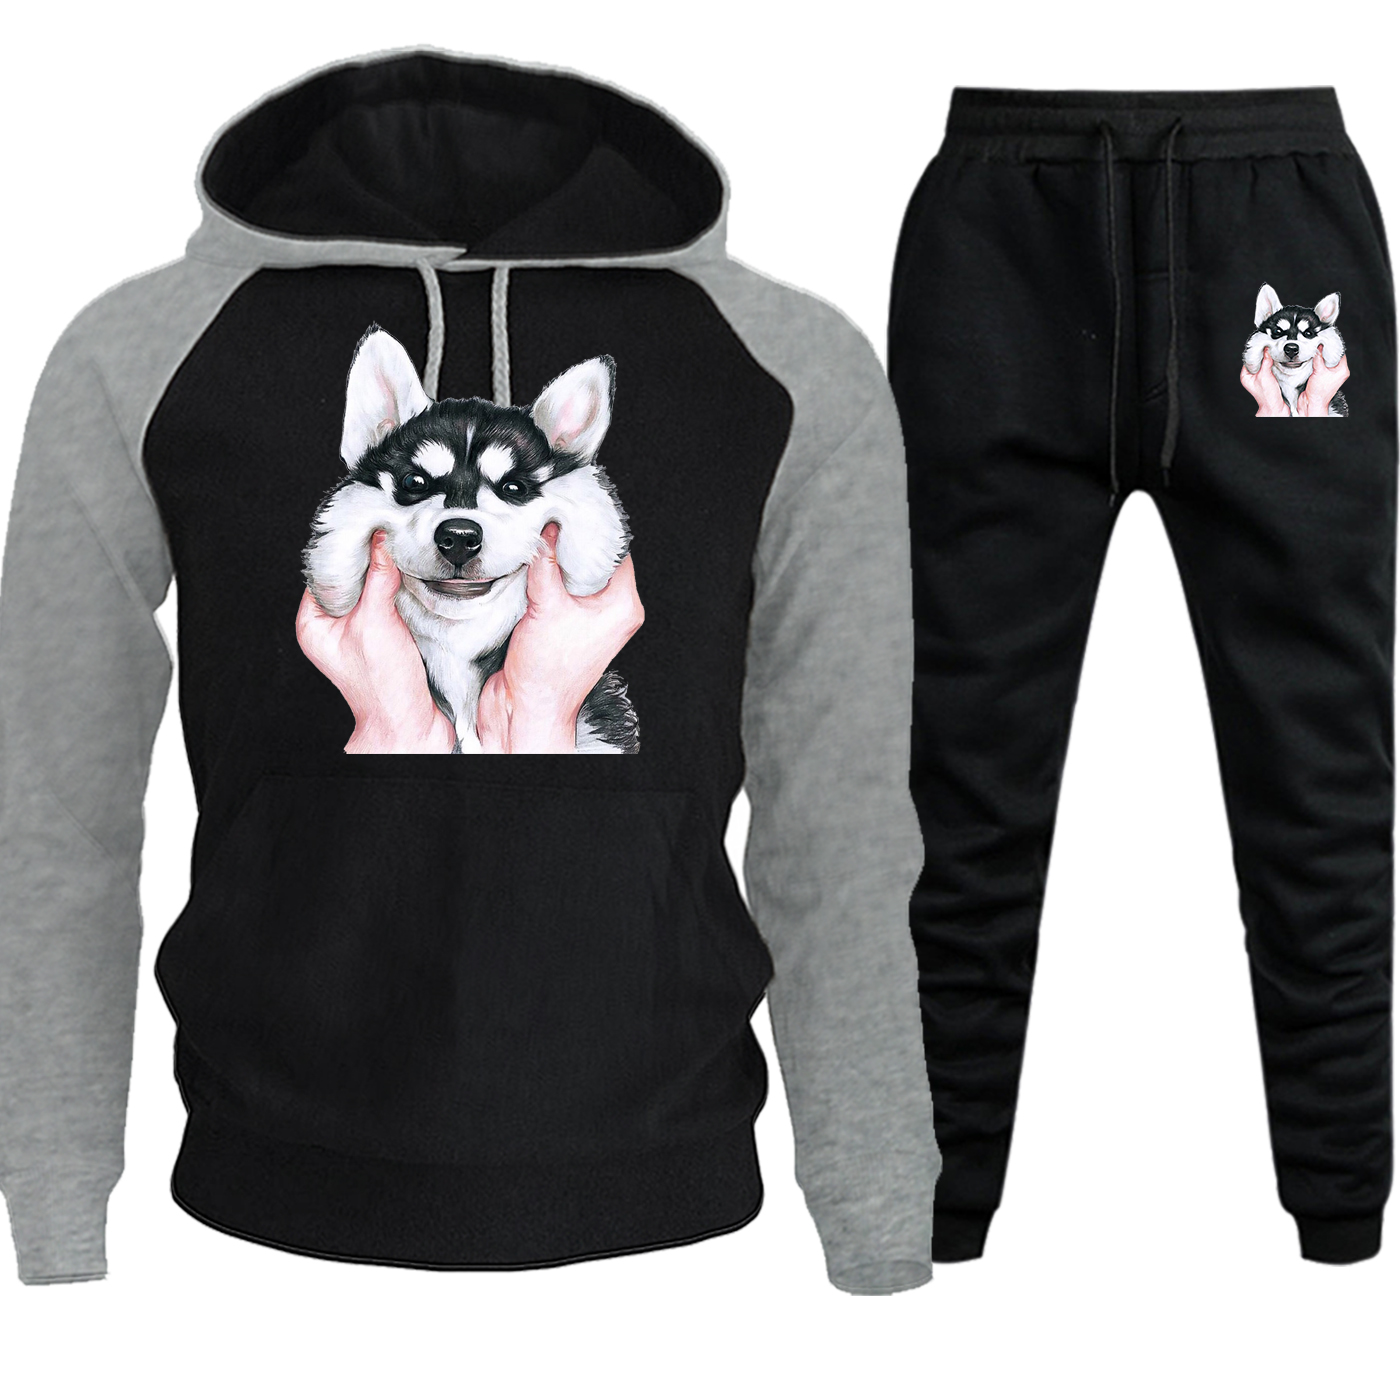 Autumn Winter 2019 New Husky Cartoon Funny Streetwear Raglan Men Hoodies Harajuku Casual Hoodies Suit Pullover+Pants 2 Piece Set